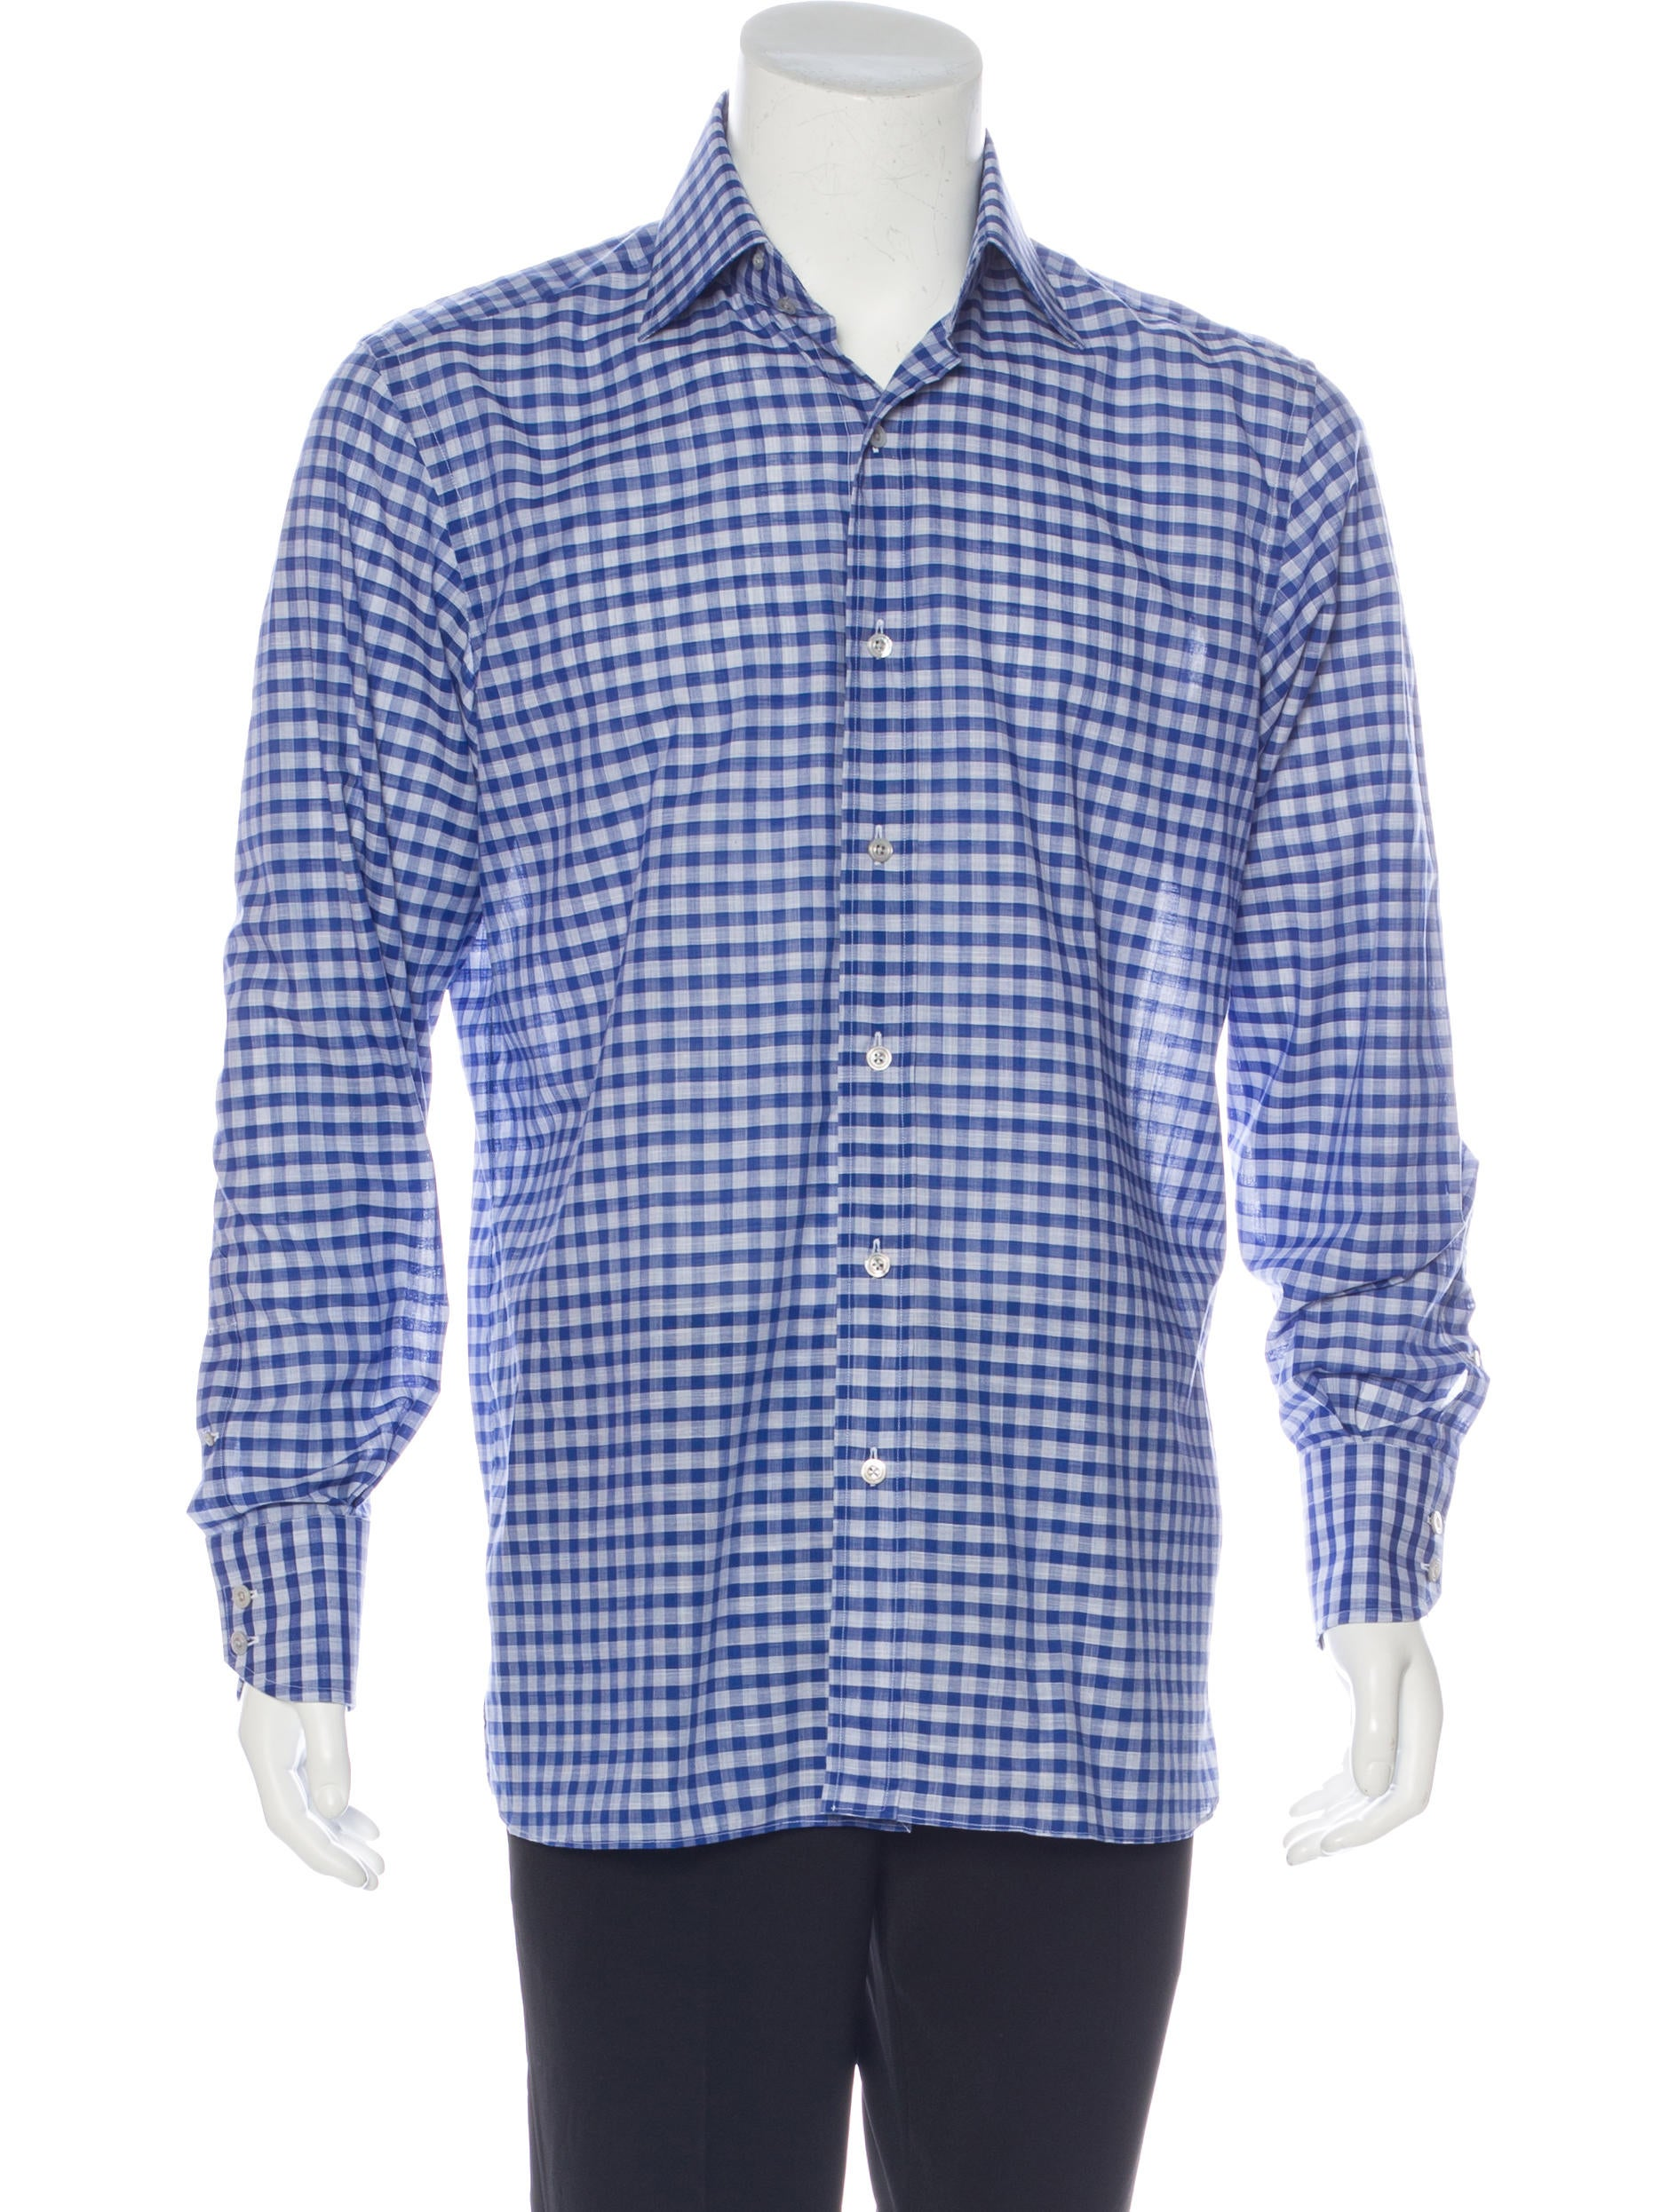 Tom ford gingham dress shirt w tags clothing tom35642 for Gingham dress shirt men